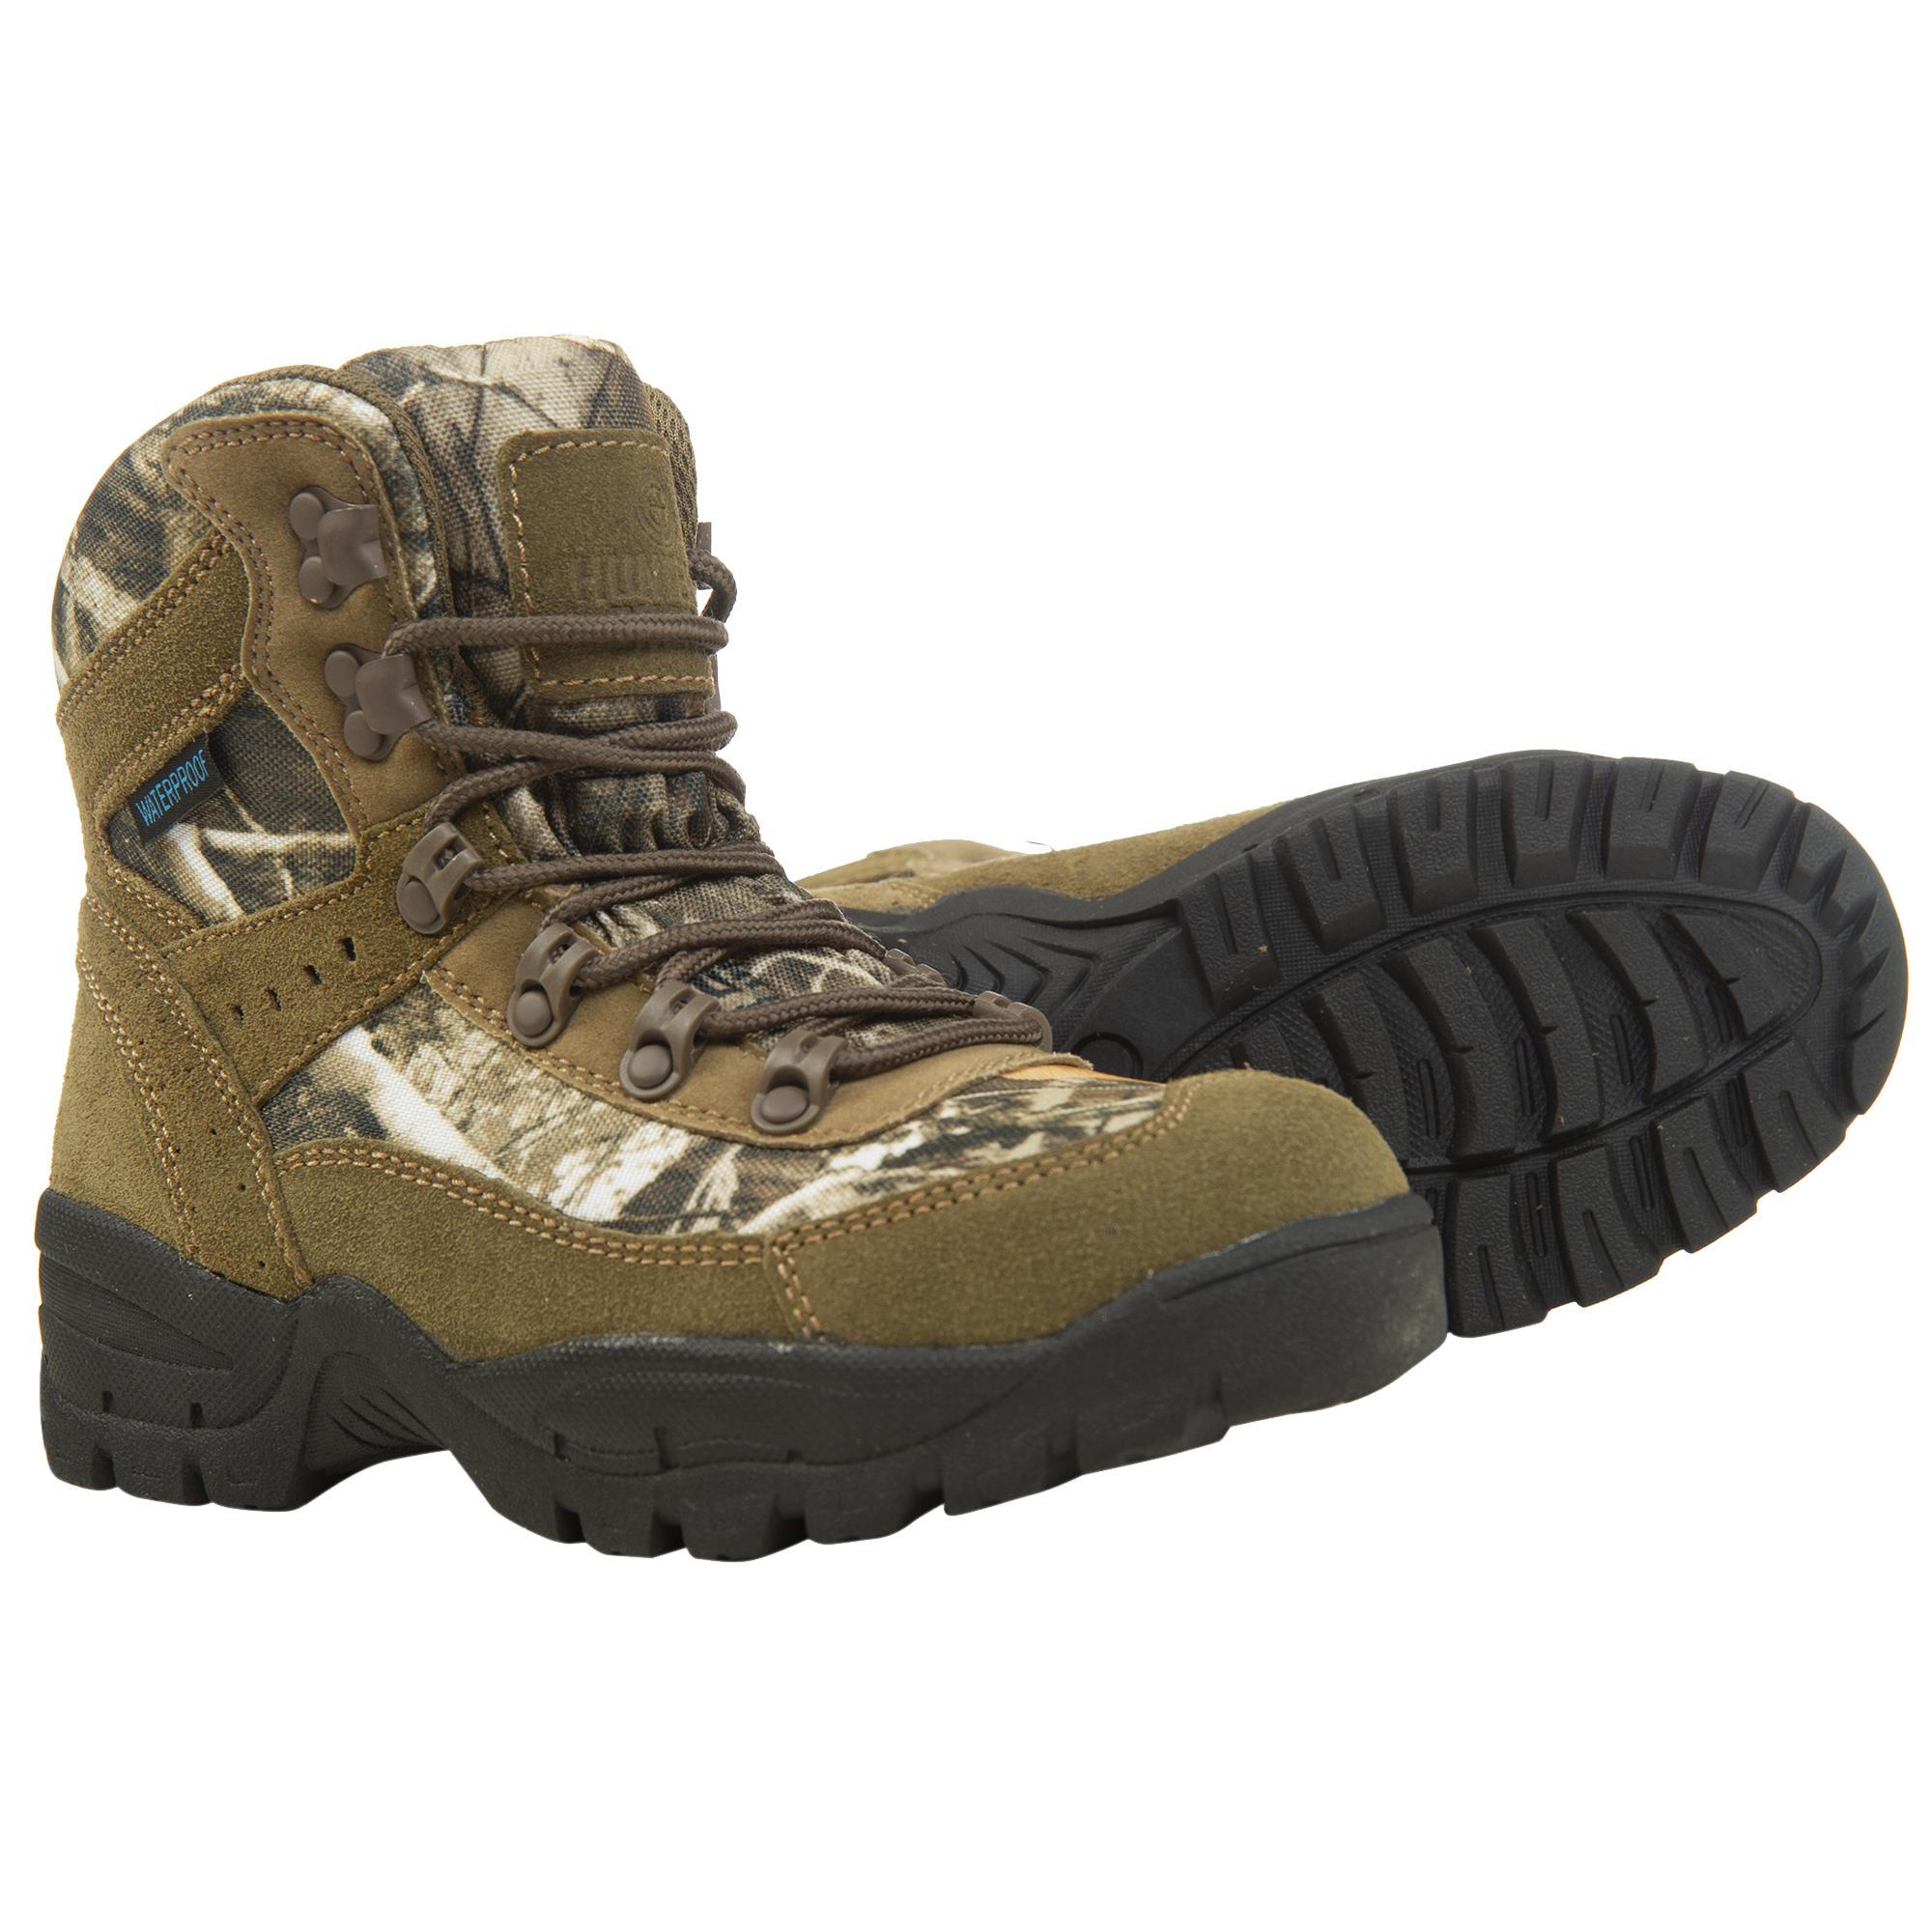 Hunter's Choice Men's 7″ Venari Waterproof Field Boot